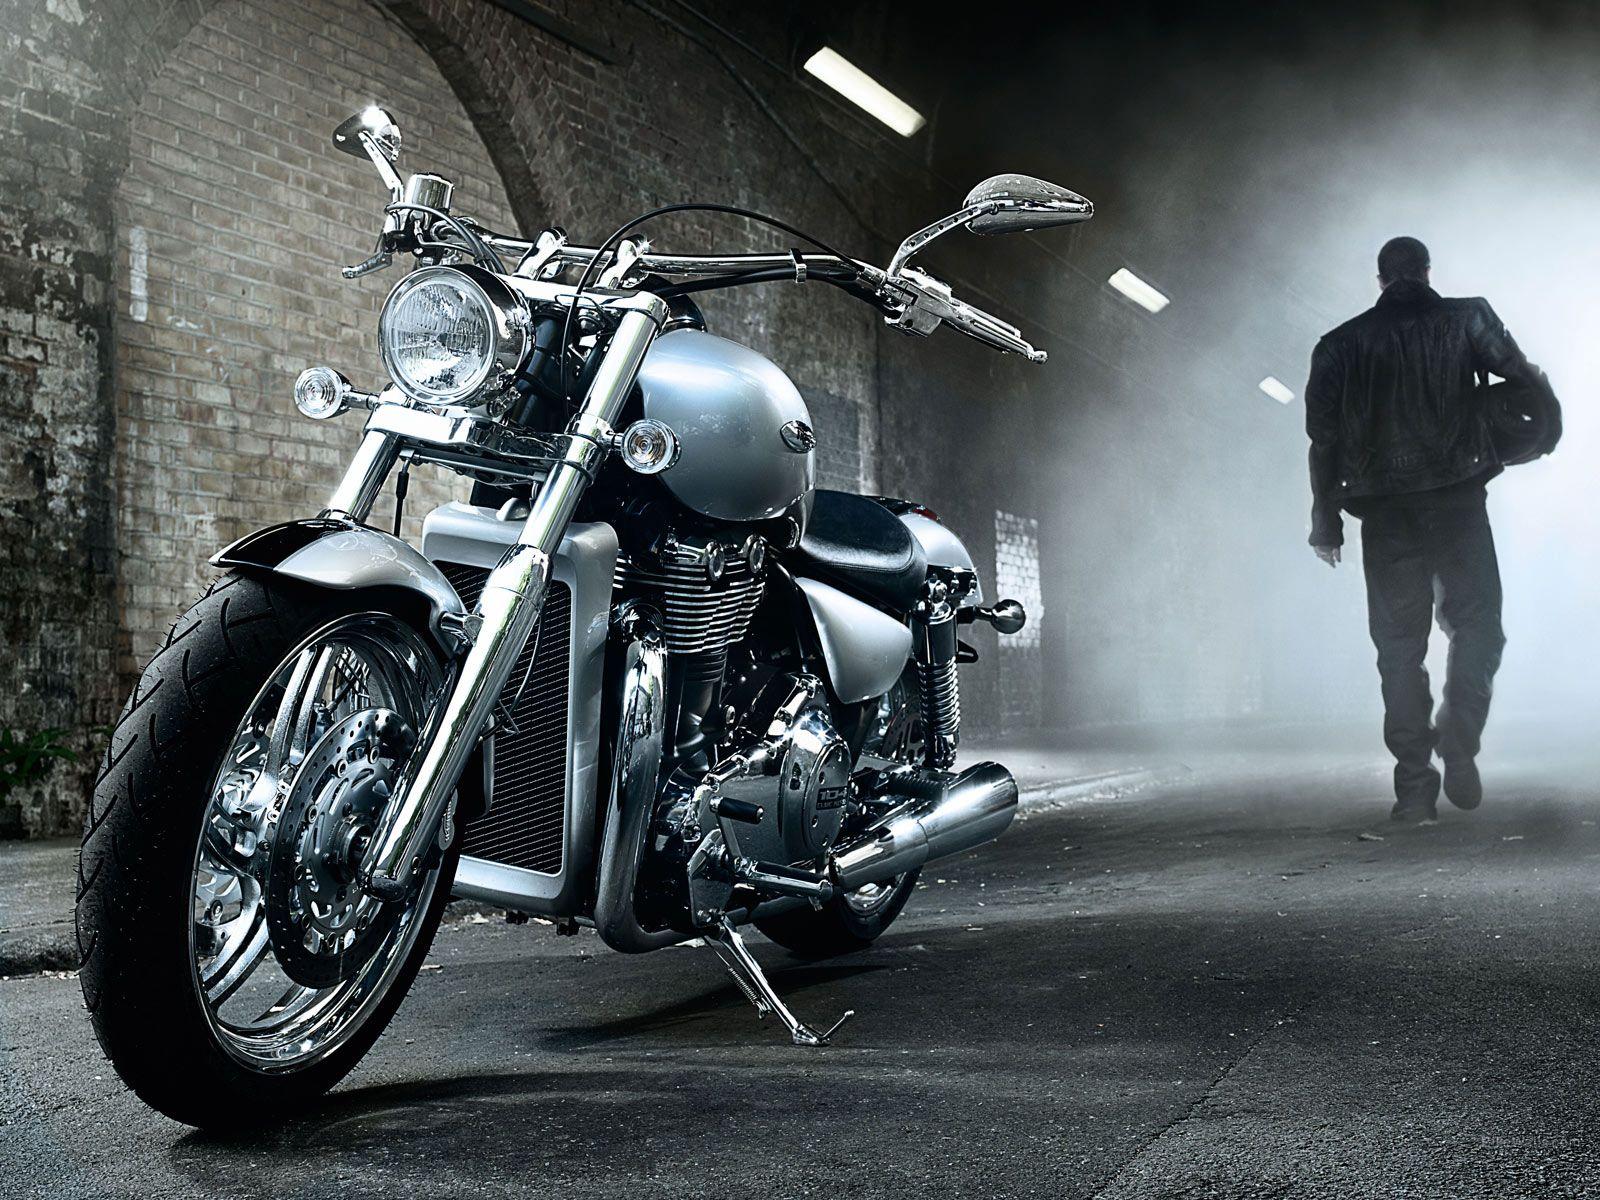 Обои Thunderbird, Triumph, bike. Мотоциклы foto 7